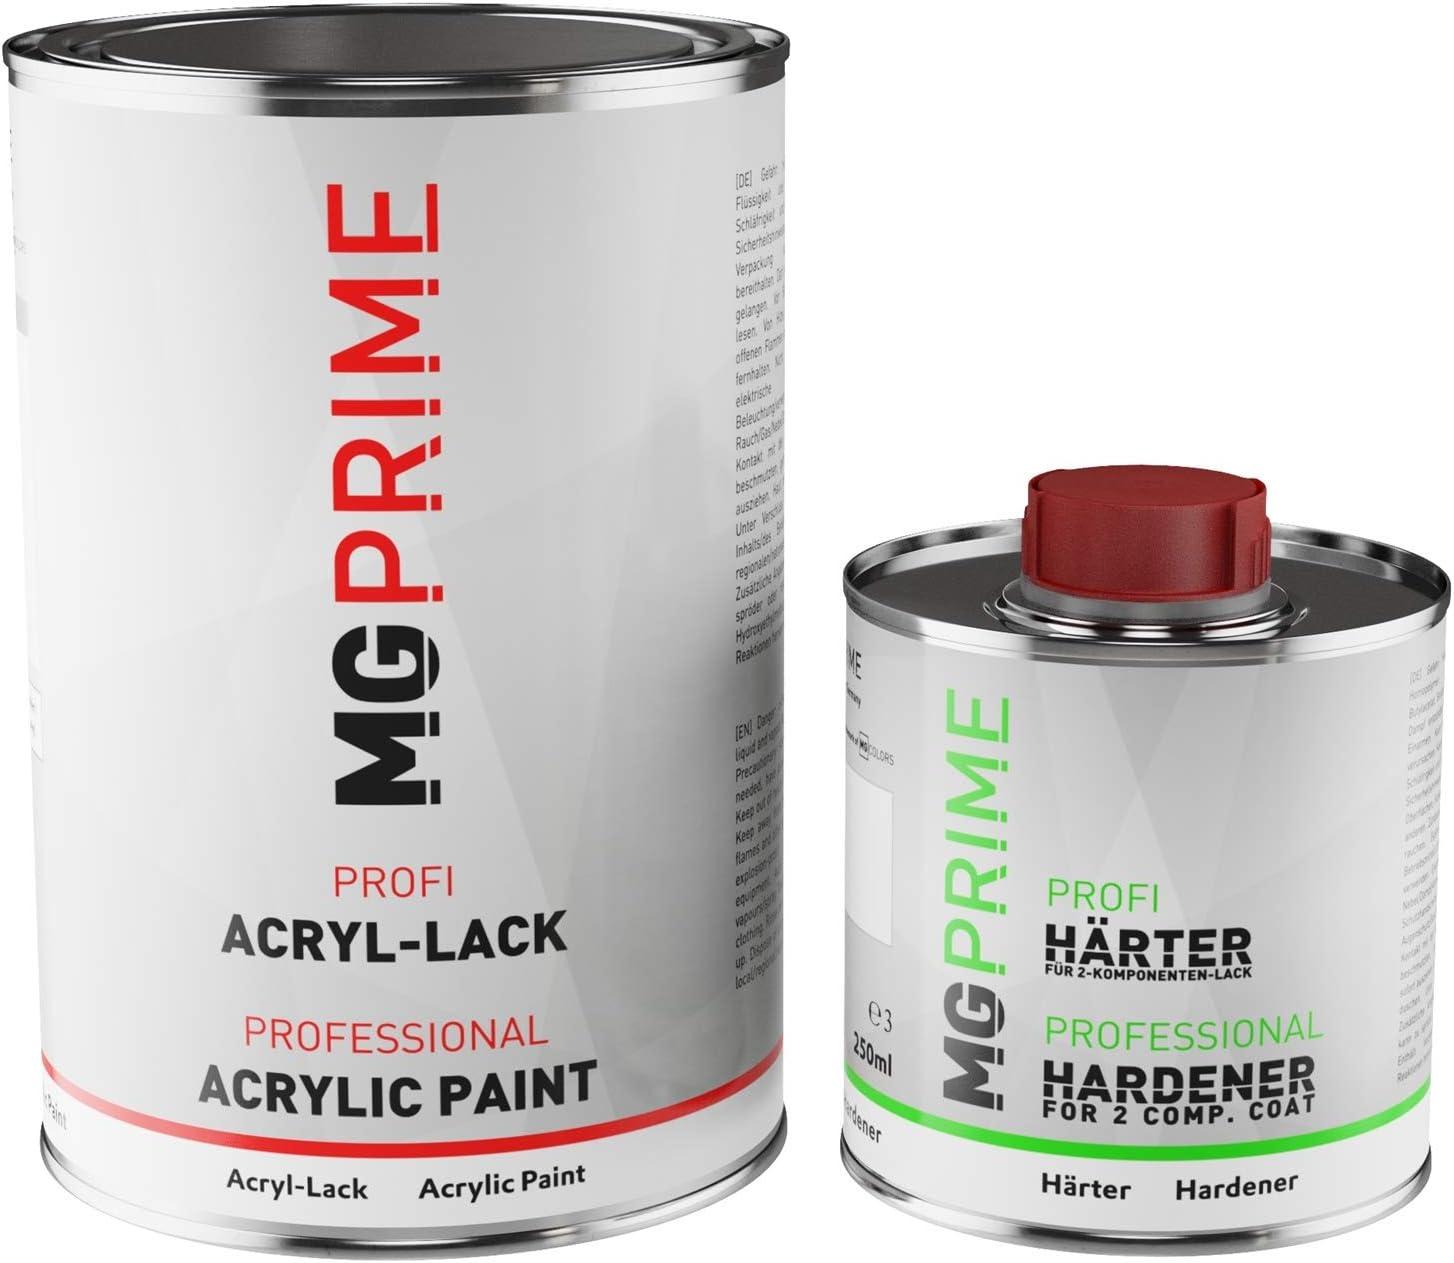 Mg Prime Ral 4009 Pastellviolett Matt Acryl Lack 1 5 Liter 1500 Ml Dose Inkl Härter Auto